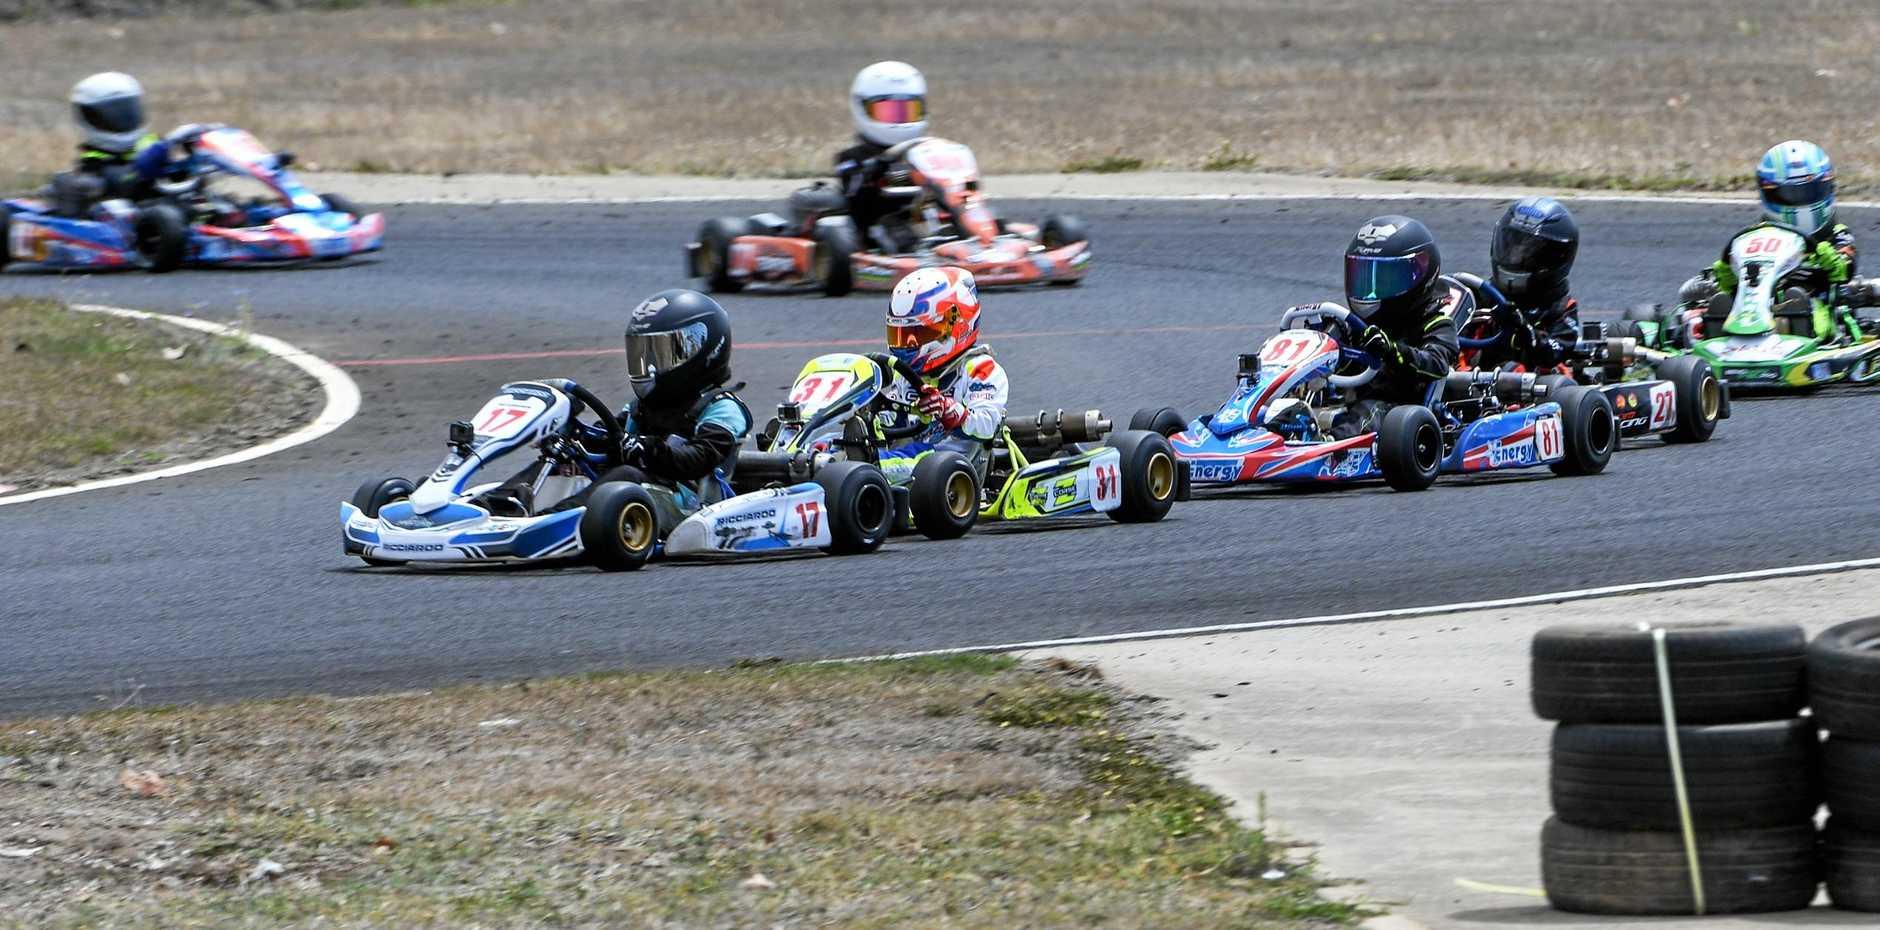 Max Acquasanta leads a pack in close racing in the Cadet 9 class.